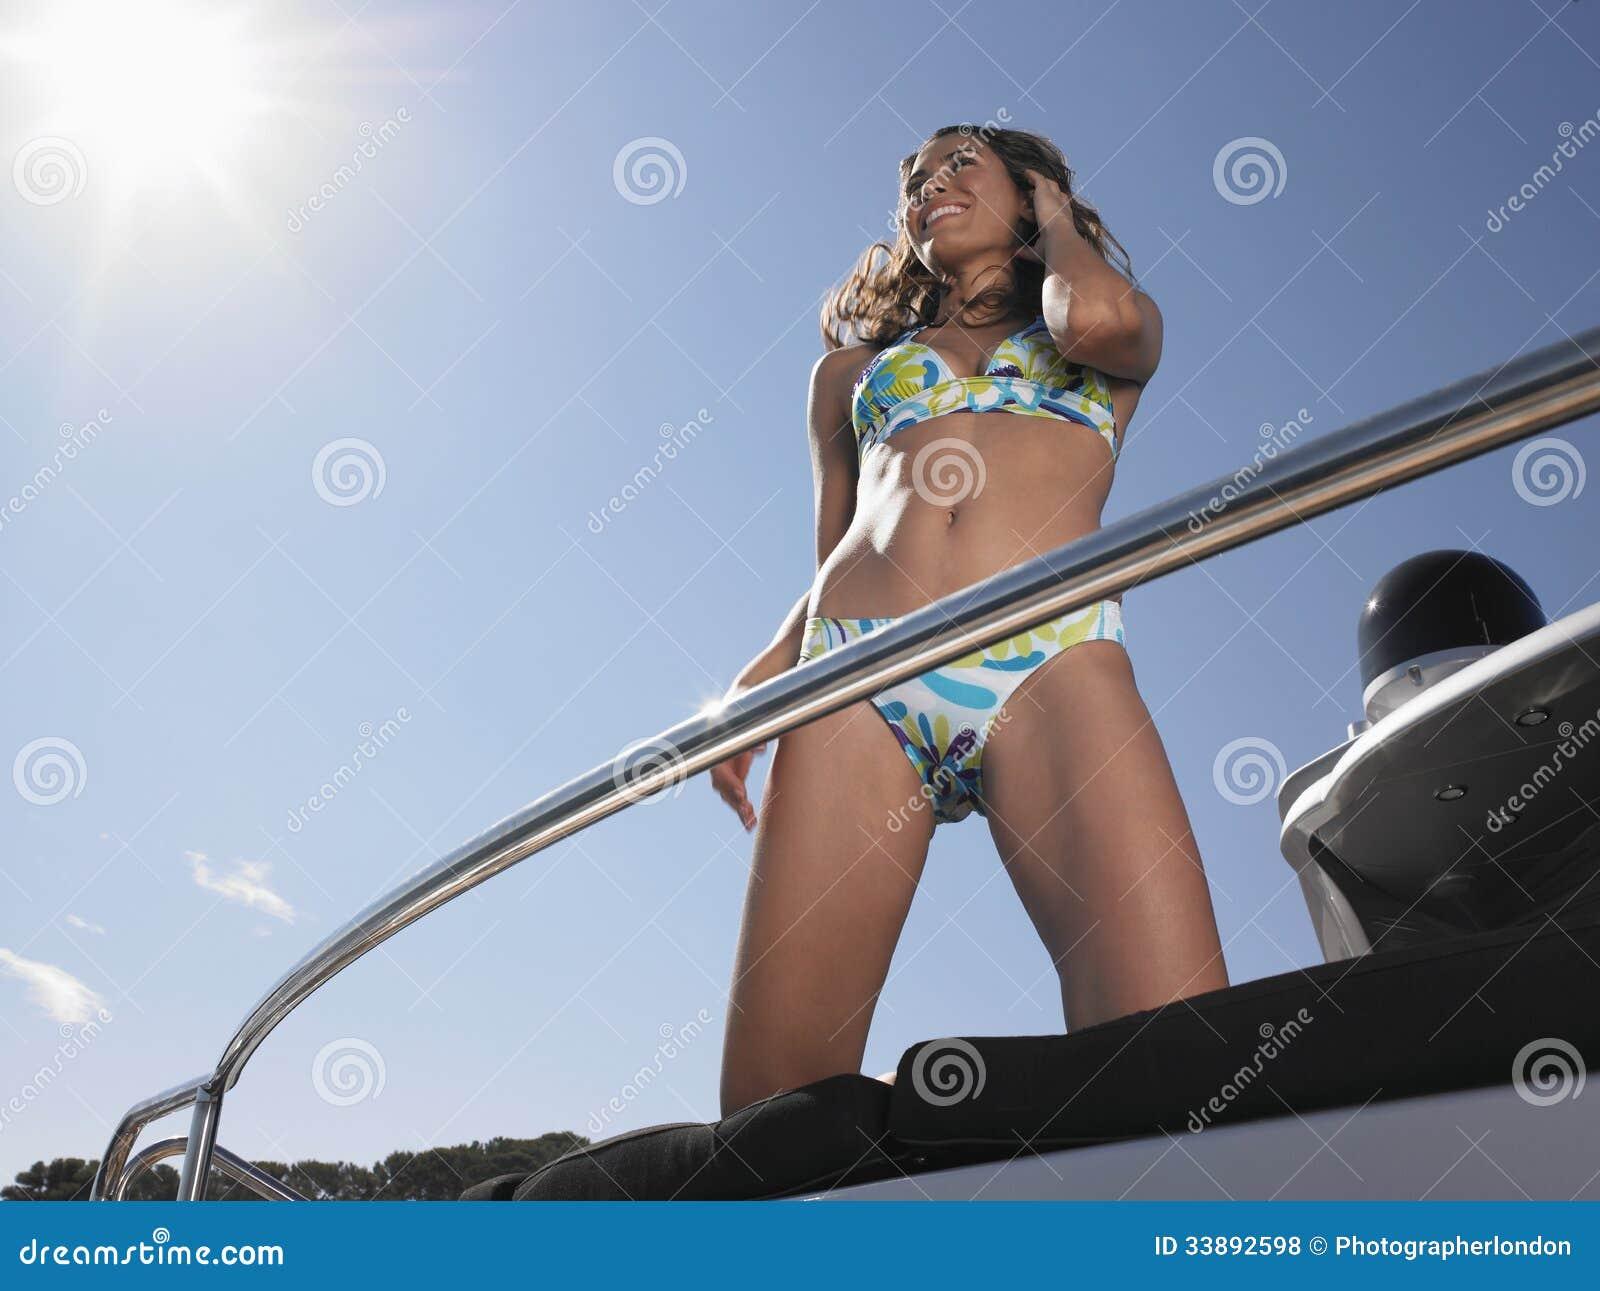 Woman In Bikini Standing On Yacht Royalty Free Stock ...